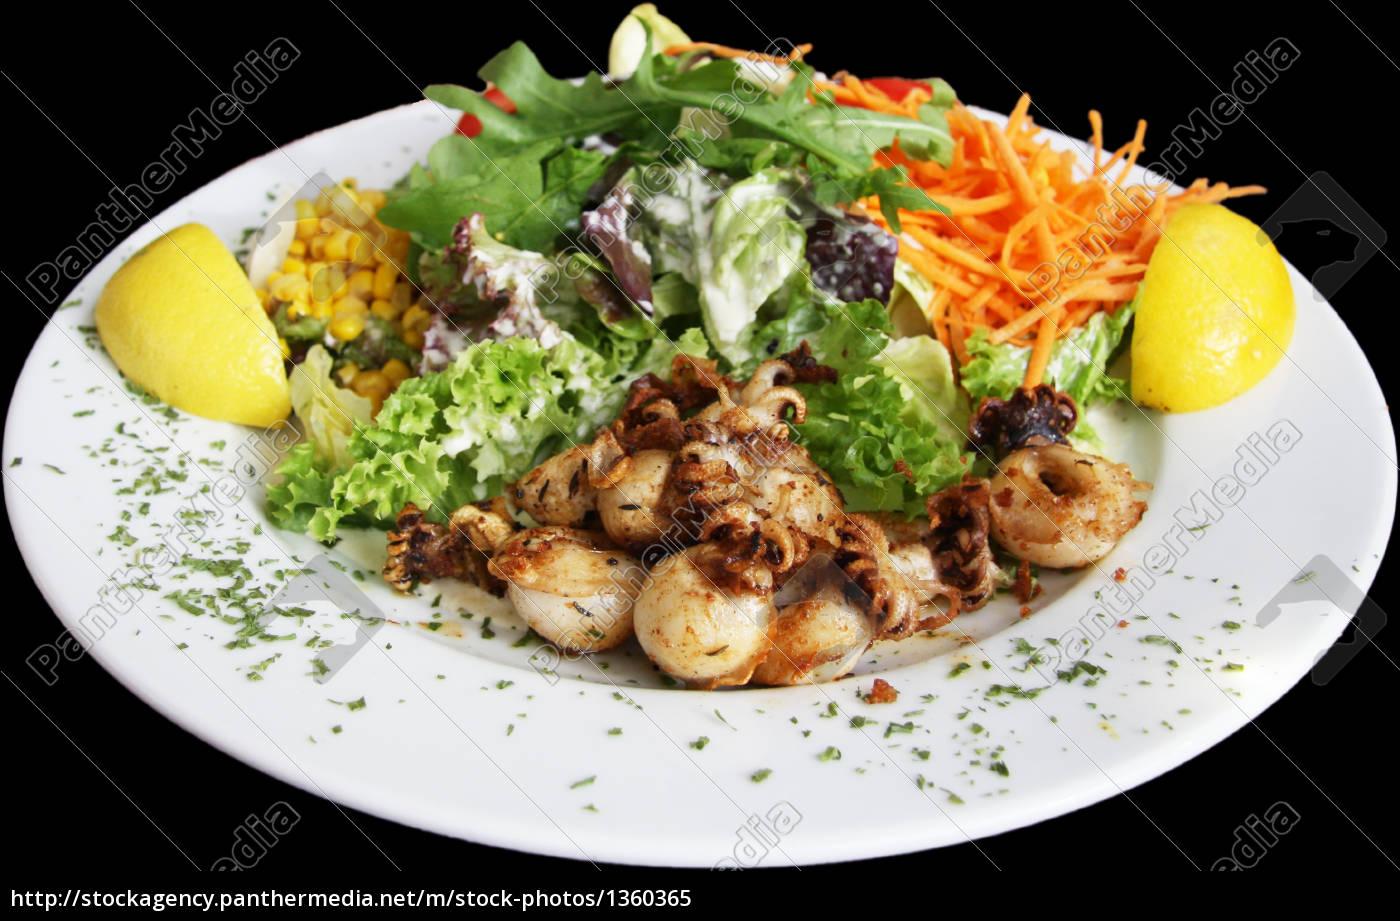 octopus, salad - 1360365